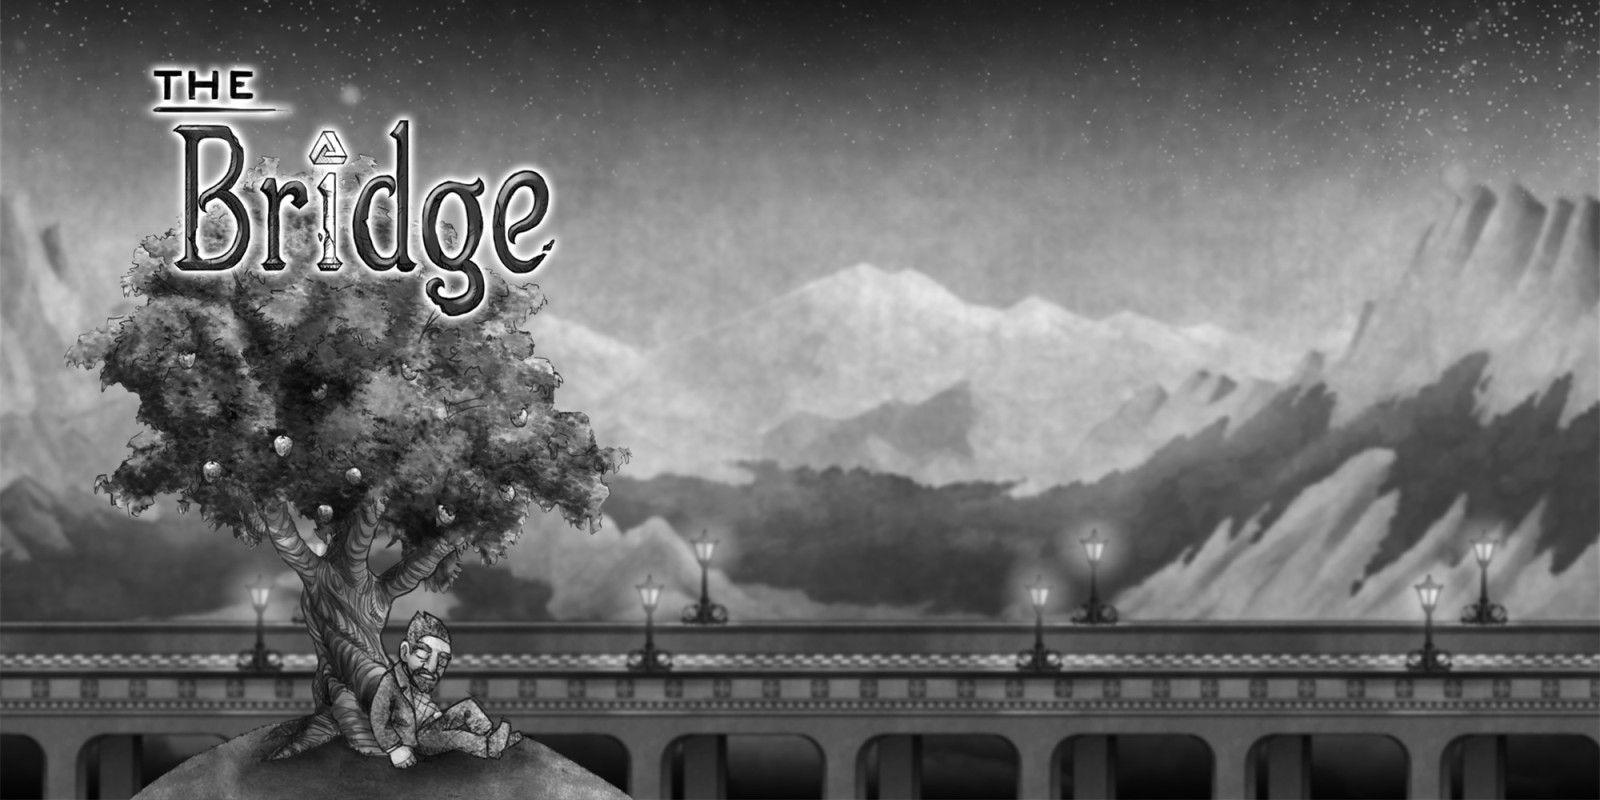 The Bridge - Nintendo Switch @ eShop - £2.69